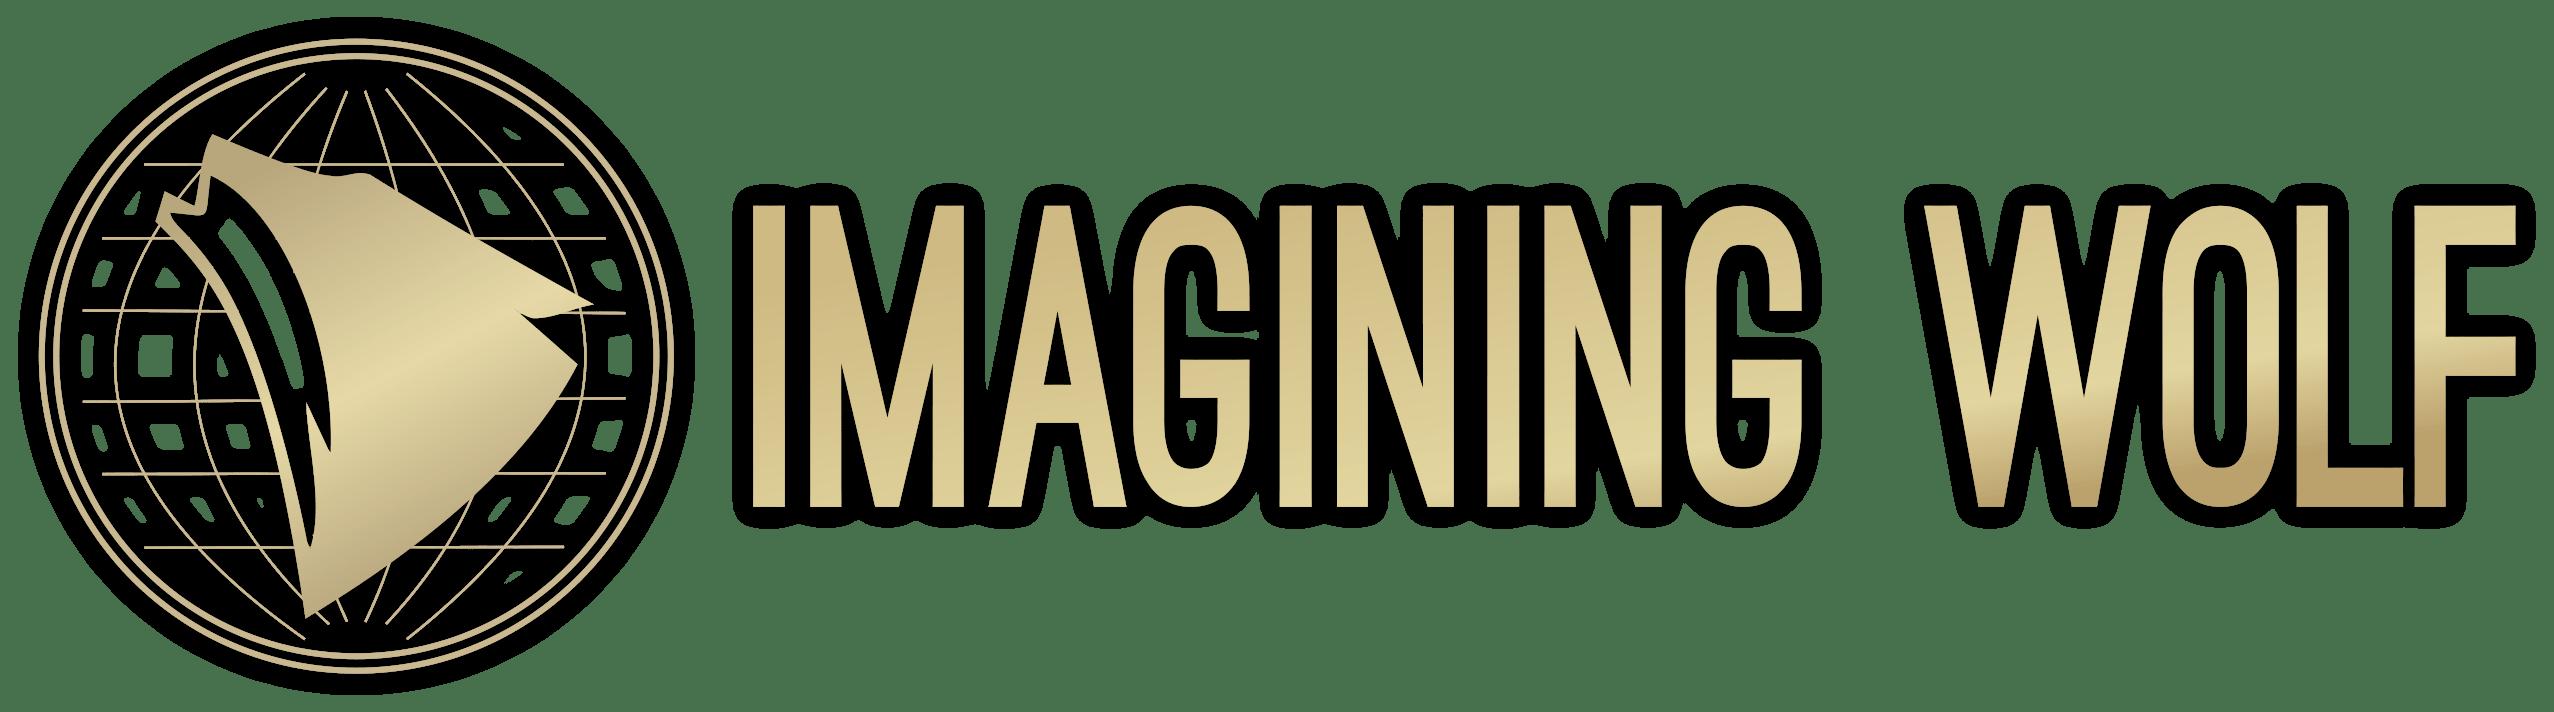 imagining wolf